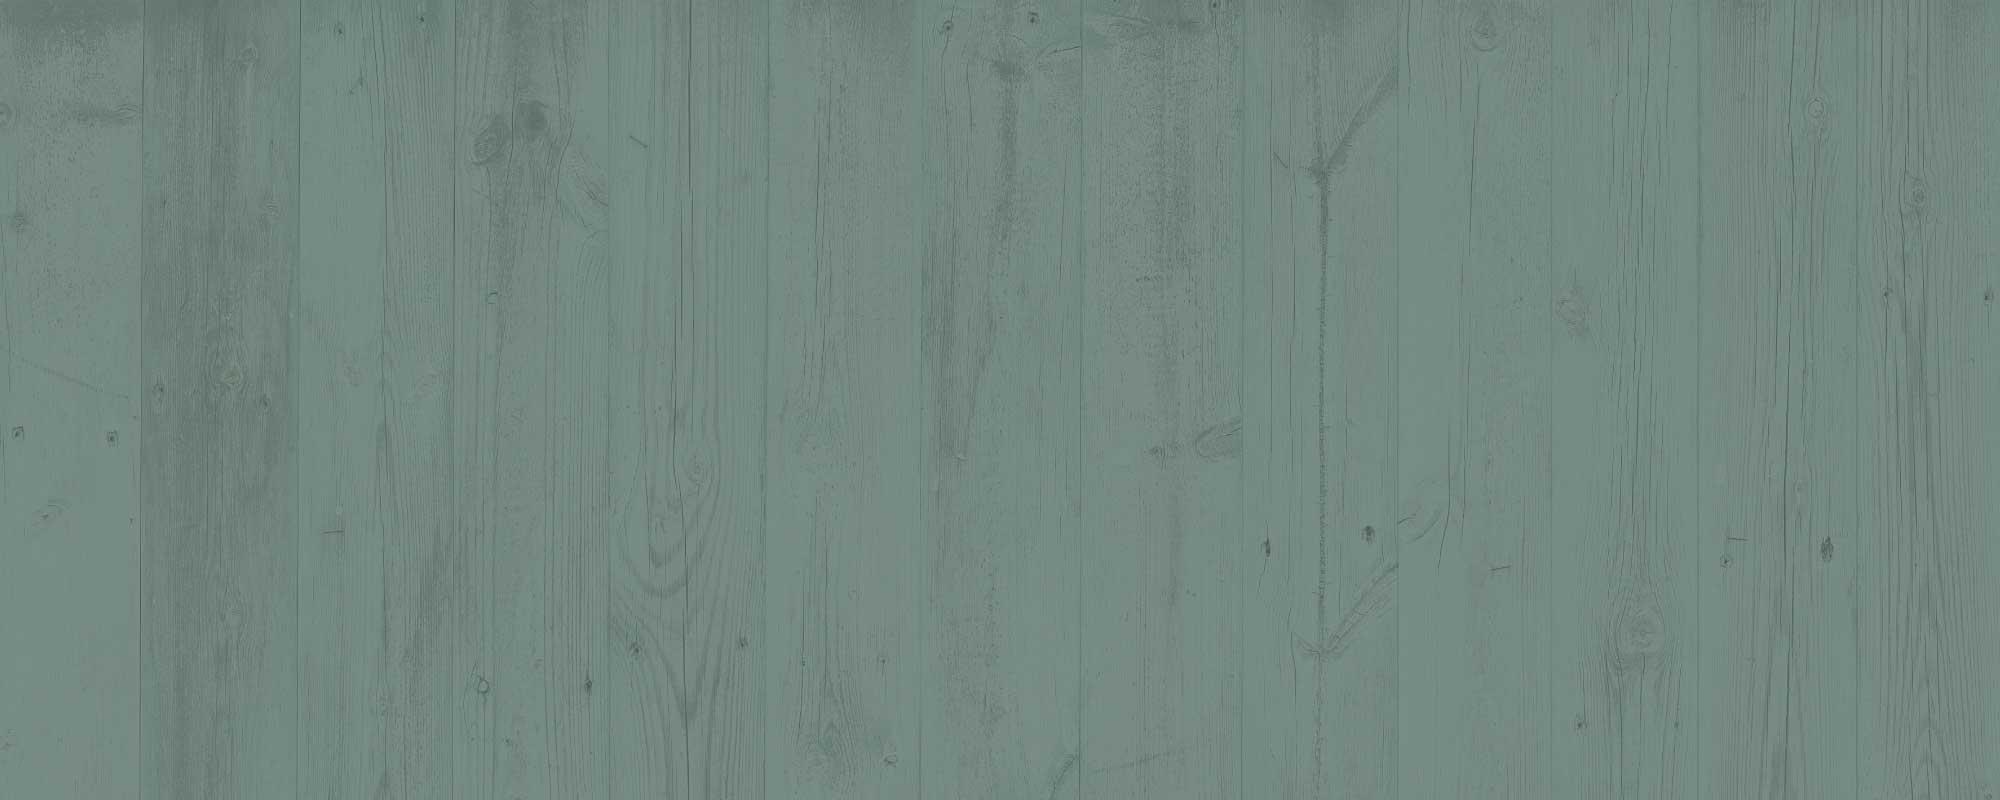 green-wood-bkg